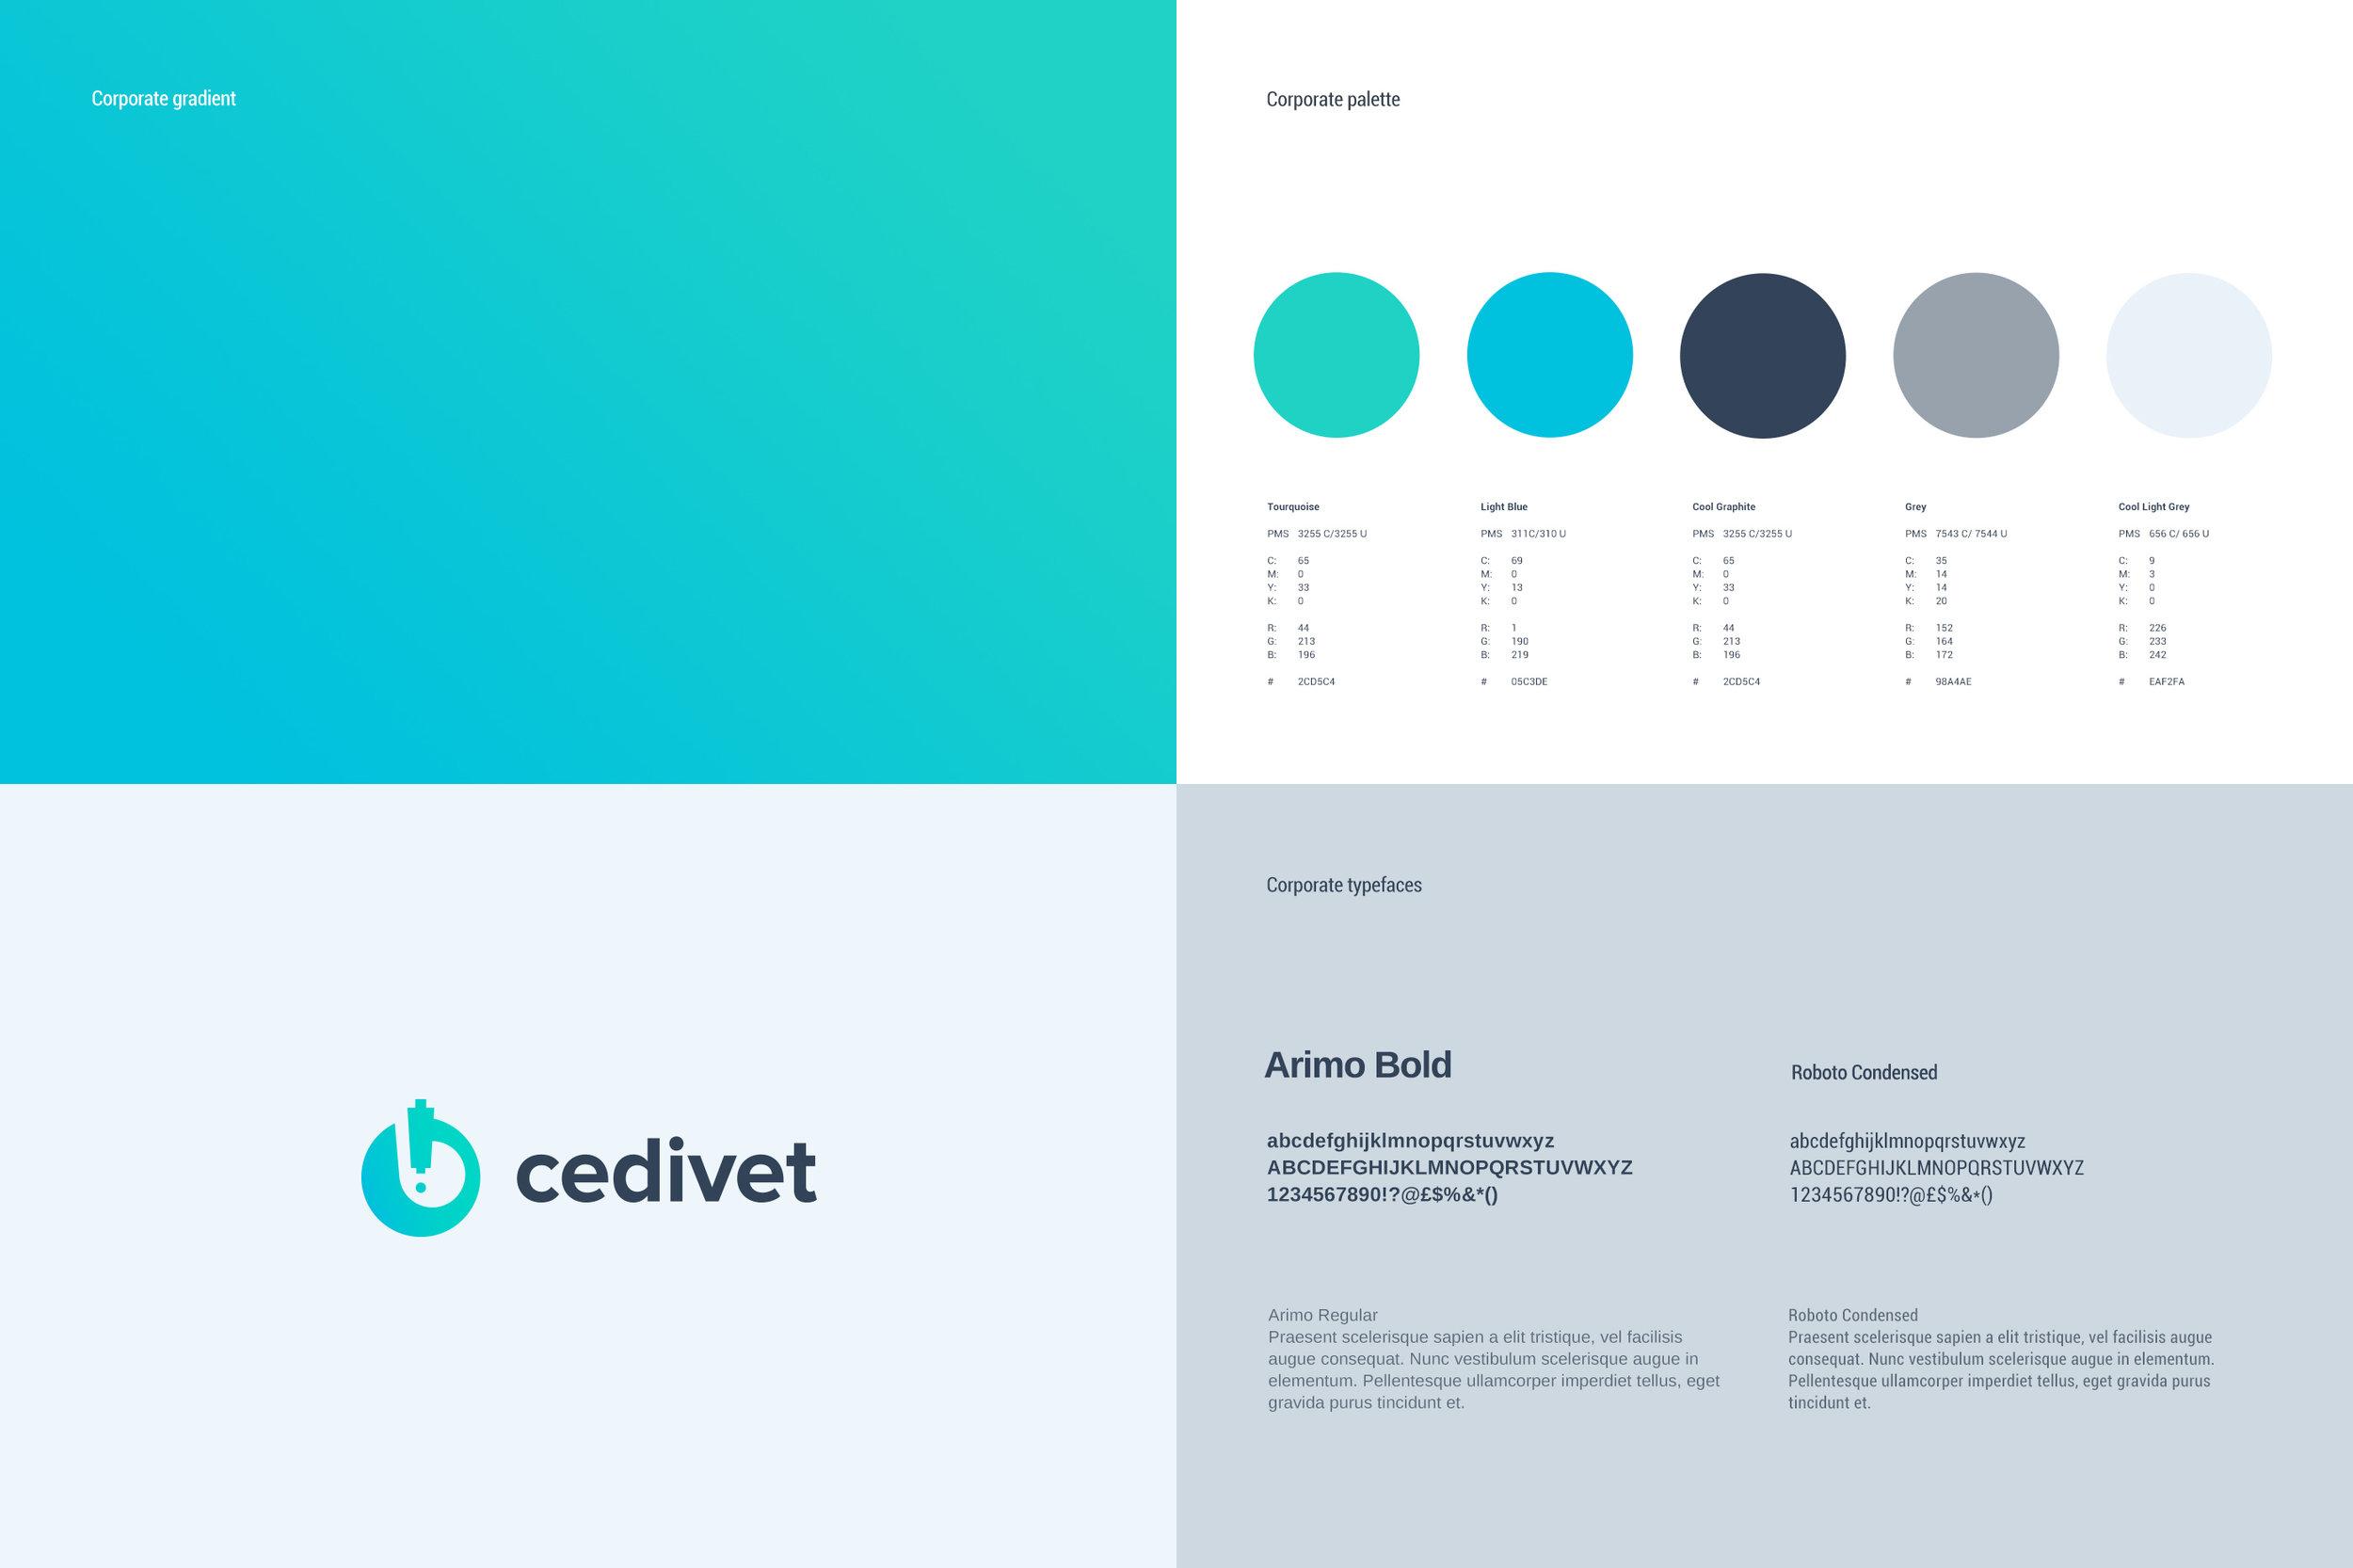 Cedivet+Veterinary+Lab+identity+by+Gen+design+studio.jpg